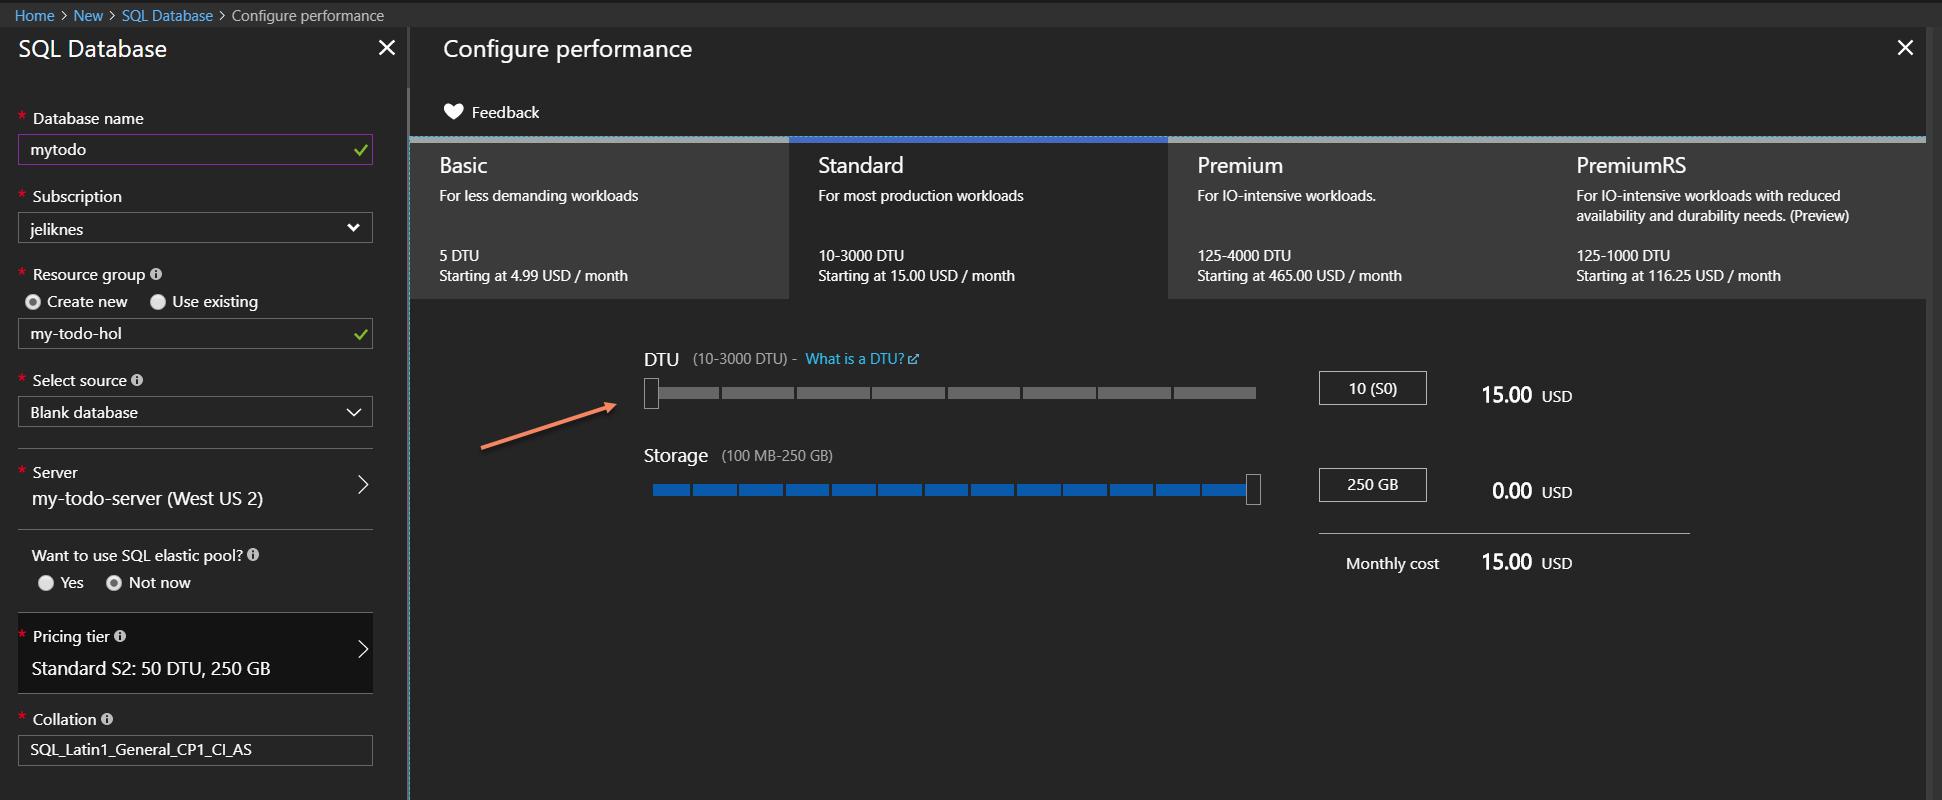 Configure performance